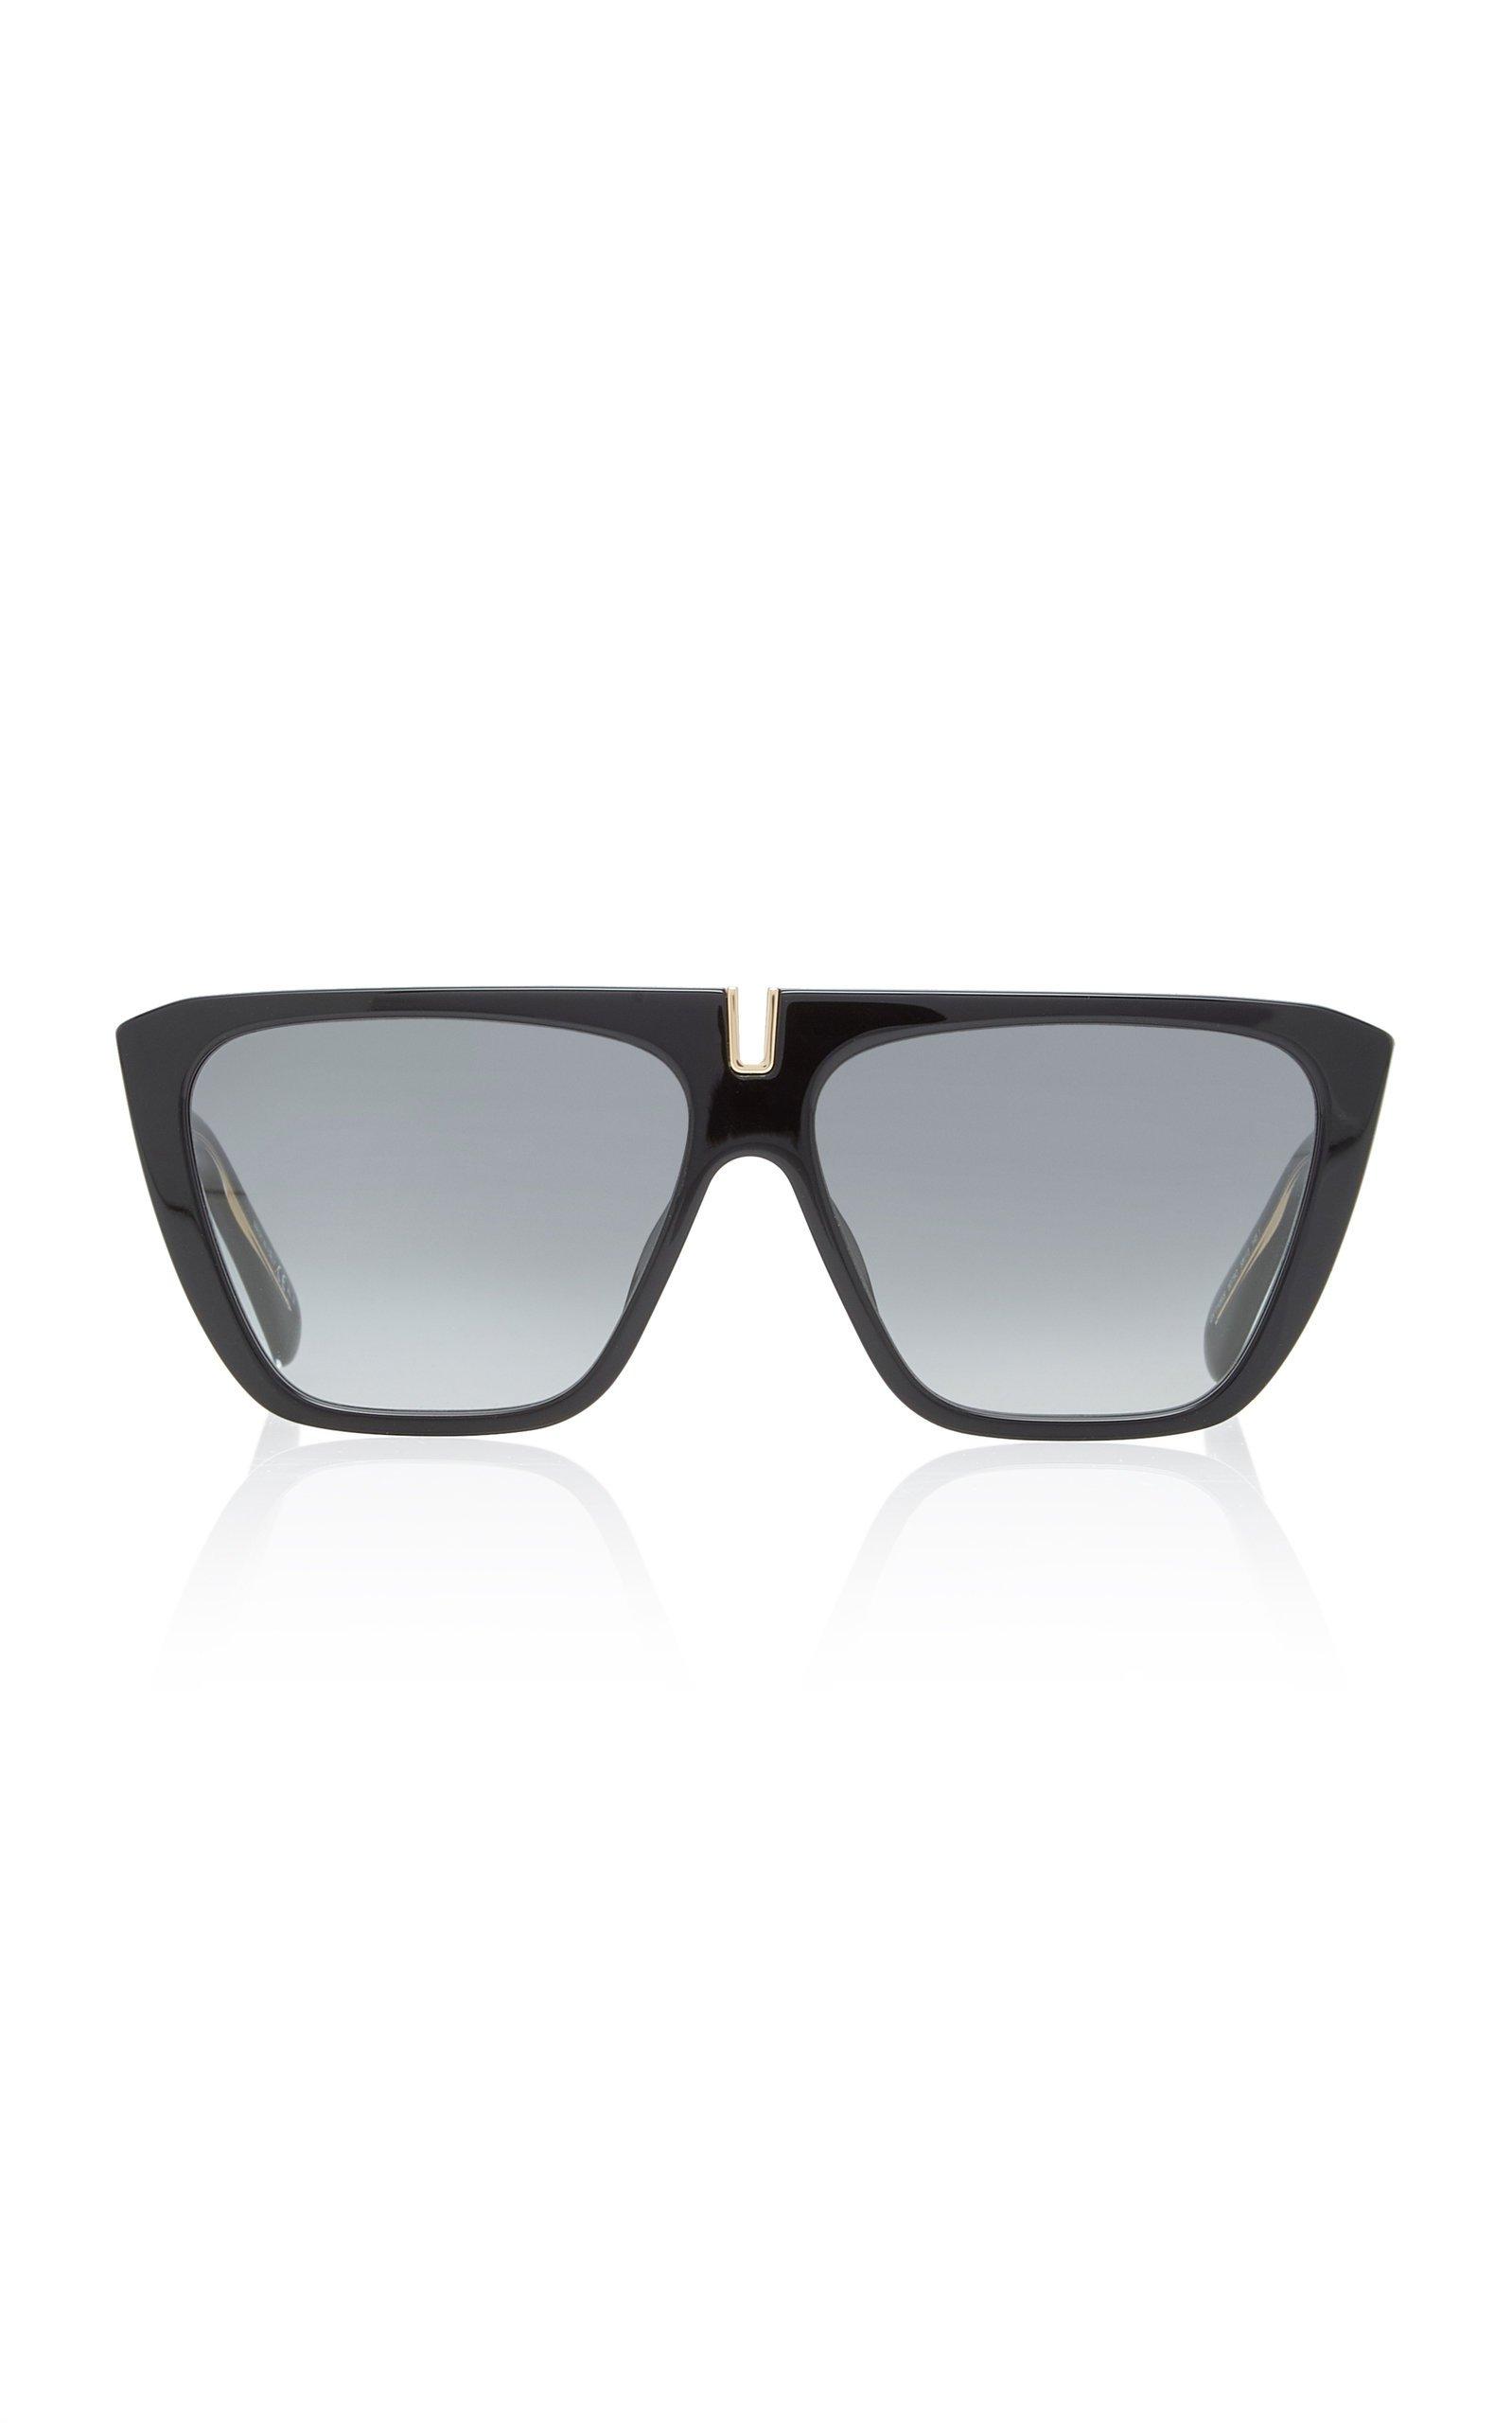 Givenchy Oversized Acetate Square-Frame Sunglasses